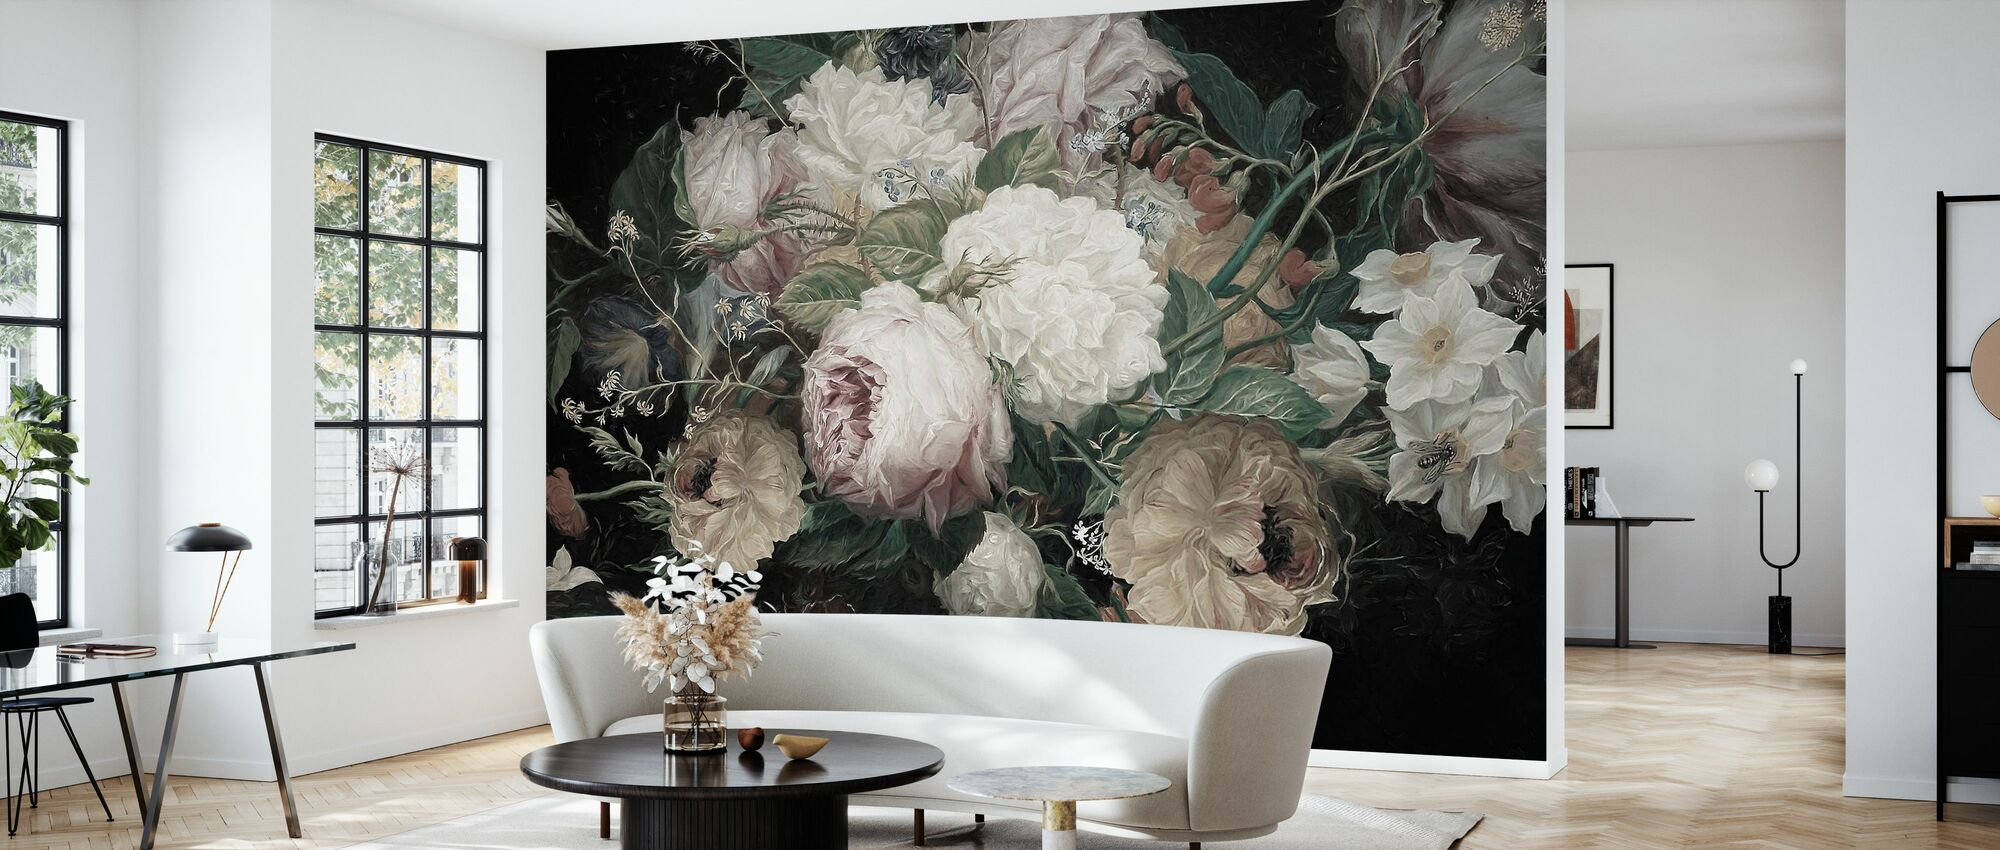 Bohemian Arrangement - Wallpaper - Living Room